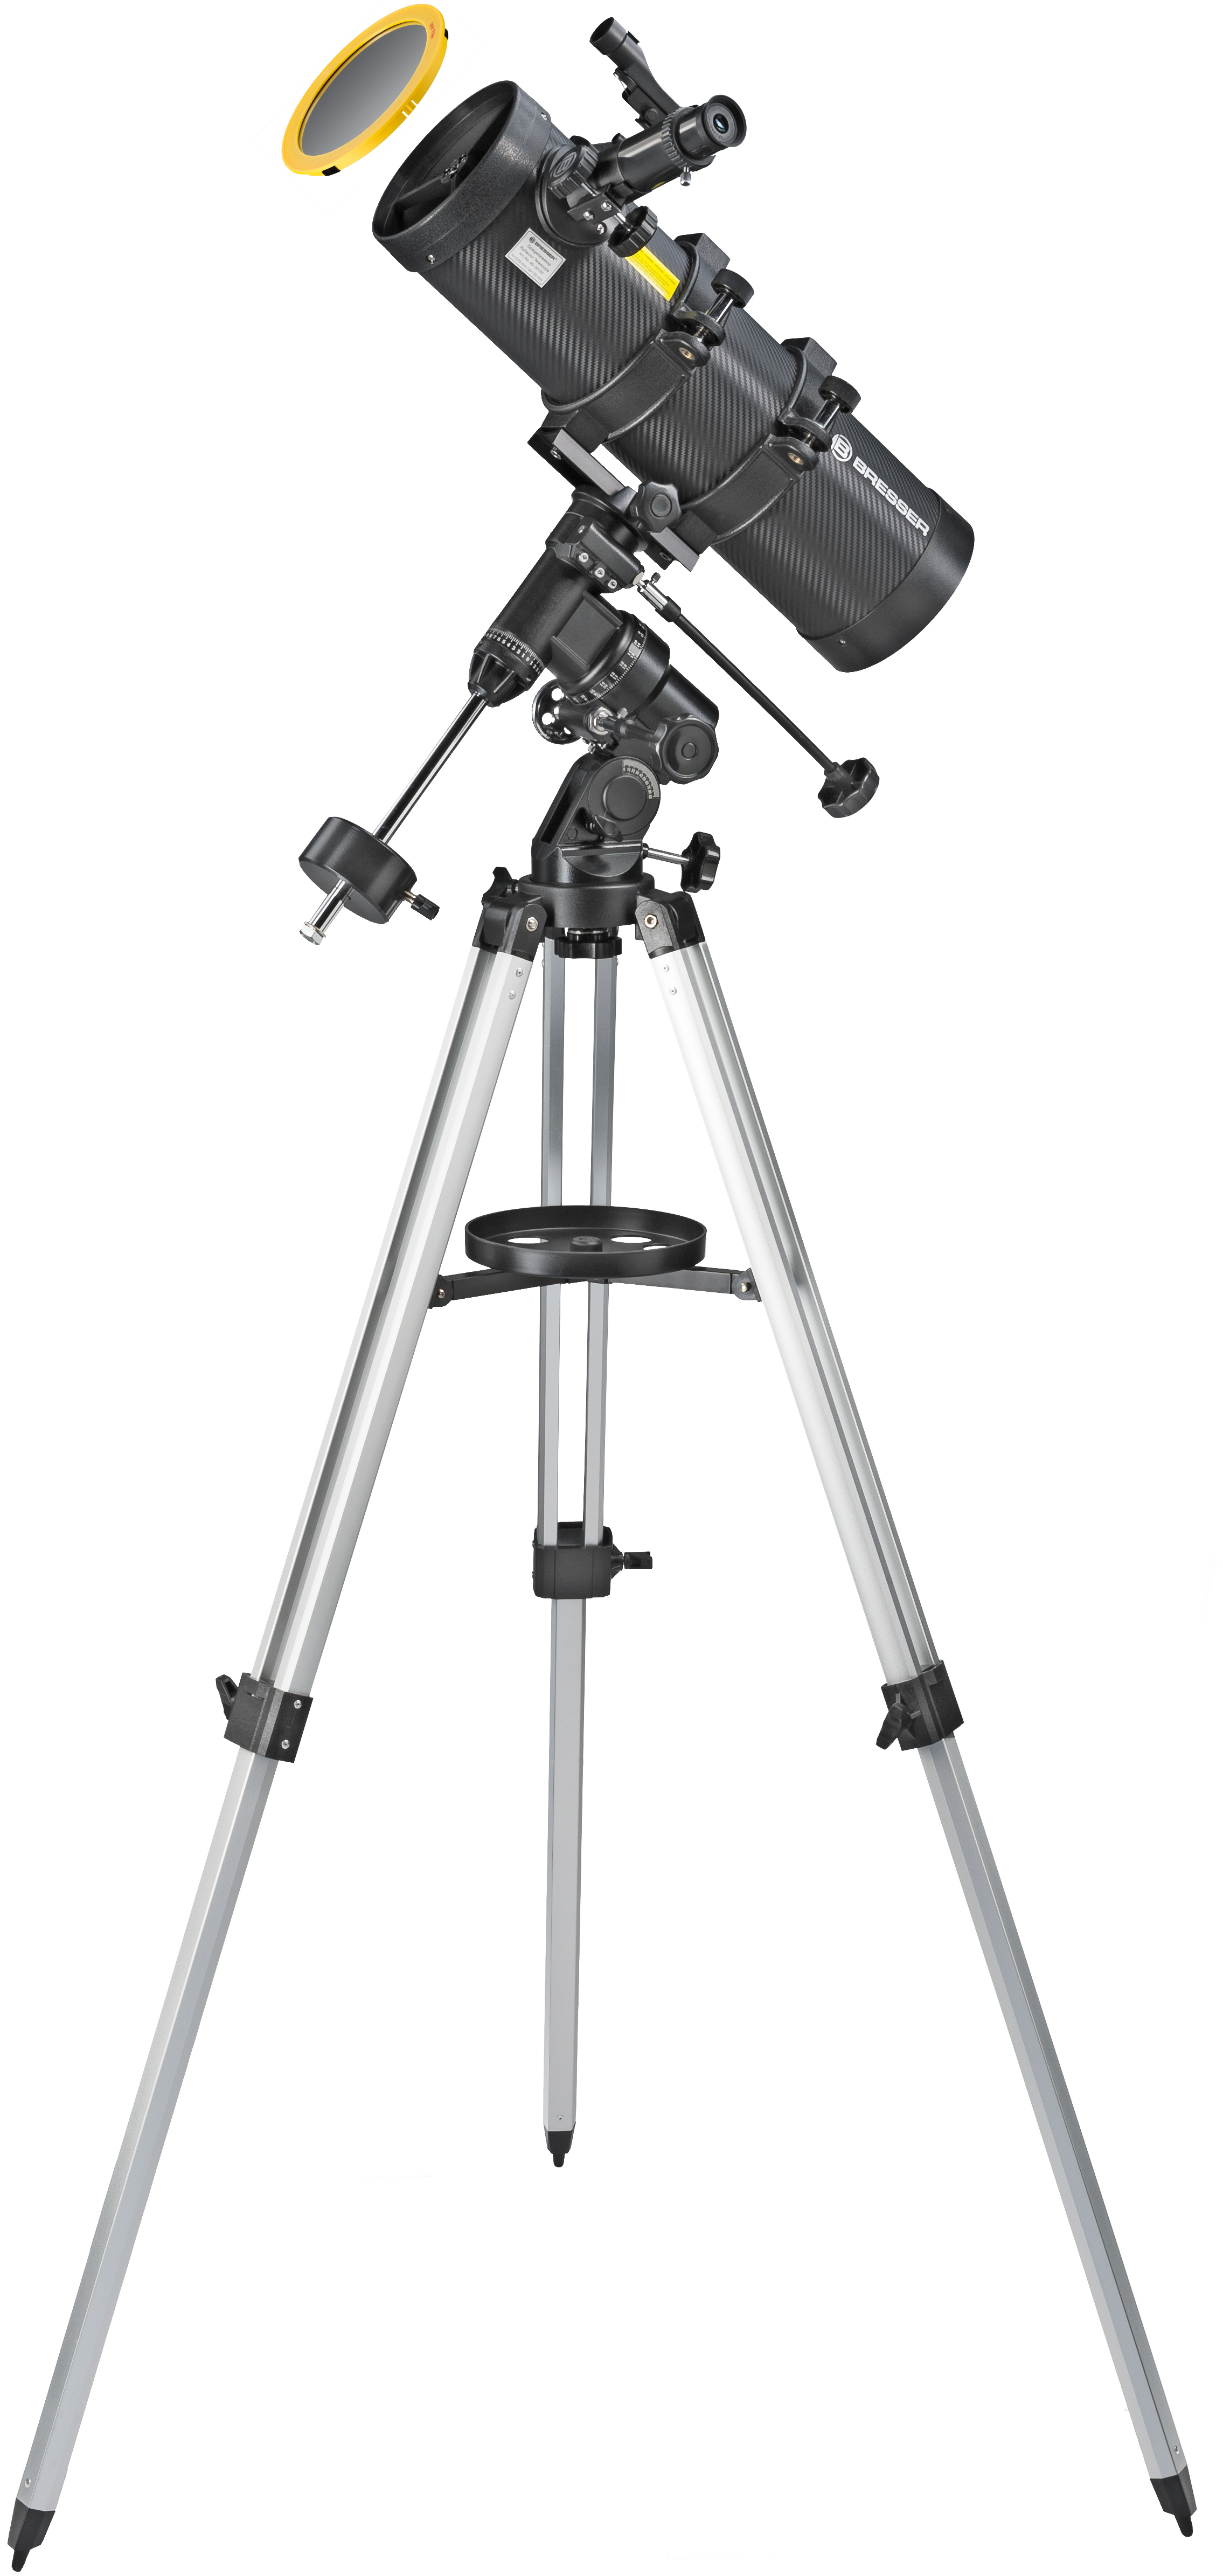 Bresser Galaxia 114//900 EQ-Sky Telescopio Newton Dise/ño de carbono con Adaptador de C/ámara de Smartphone